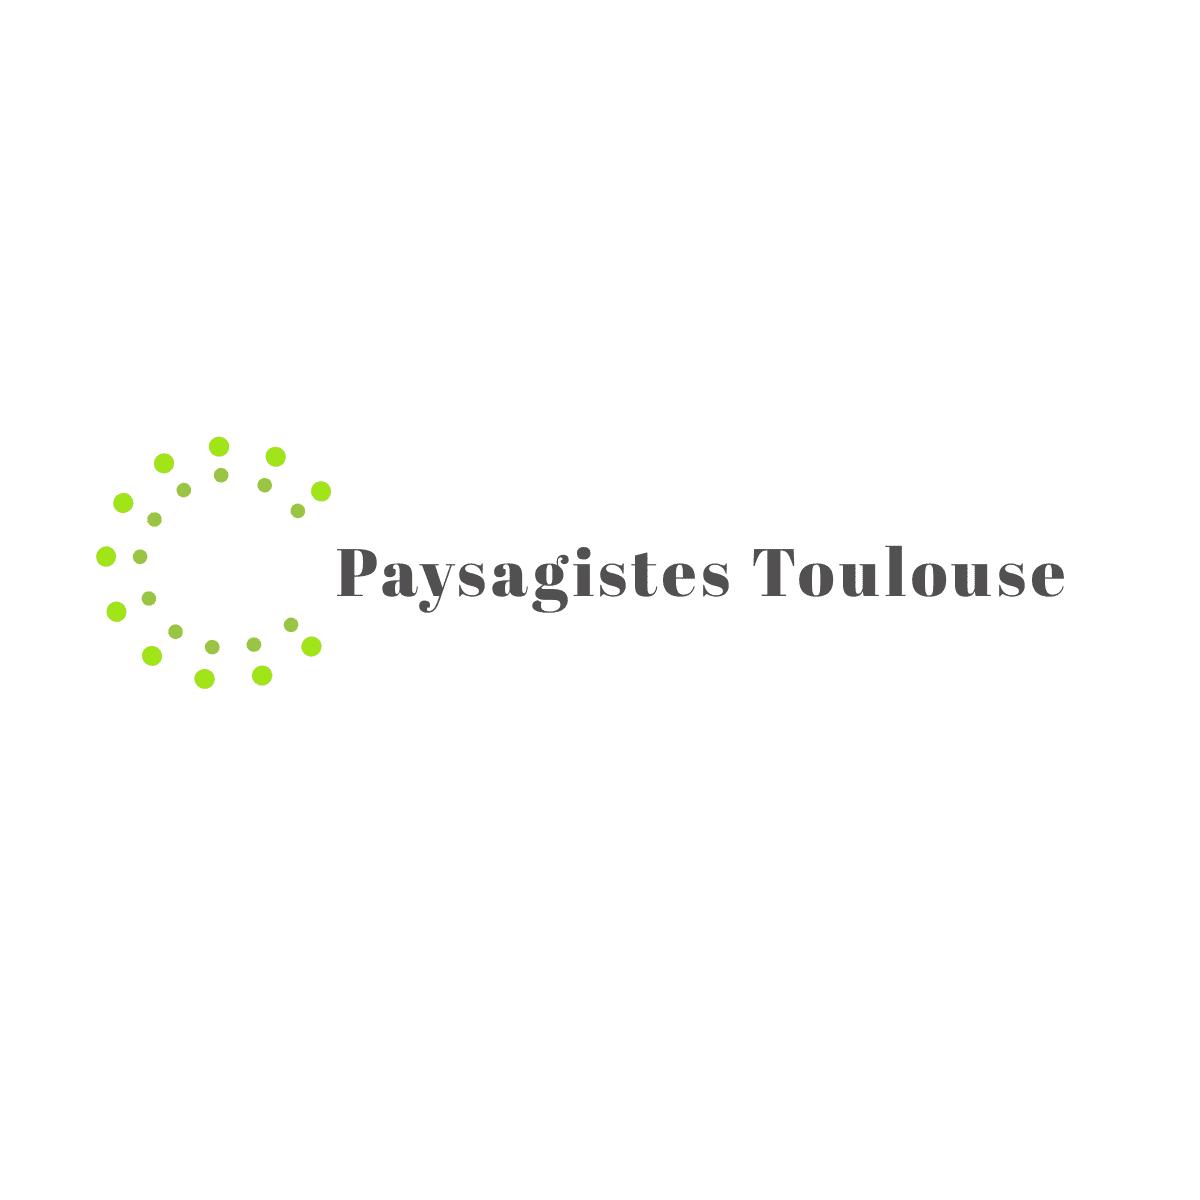 logo paysagistes toulouse